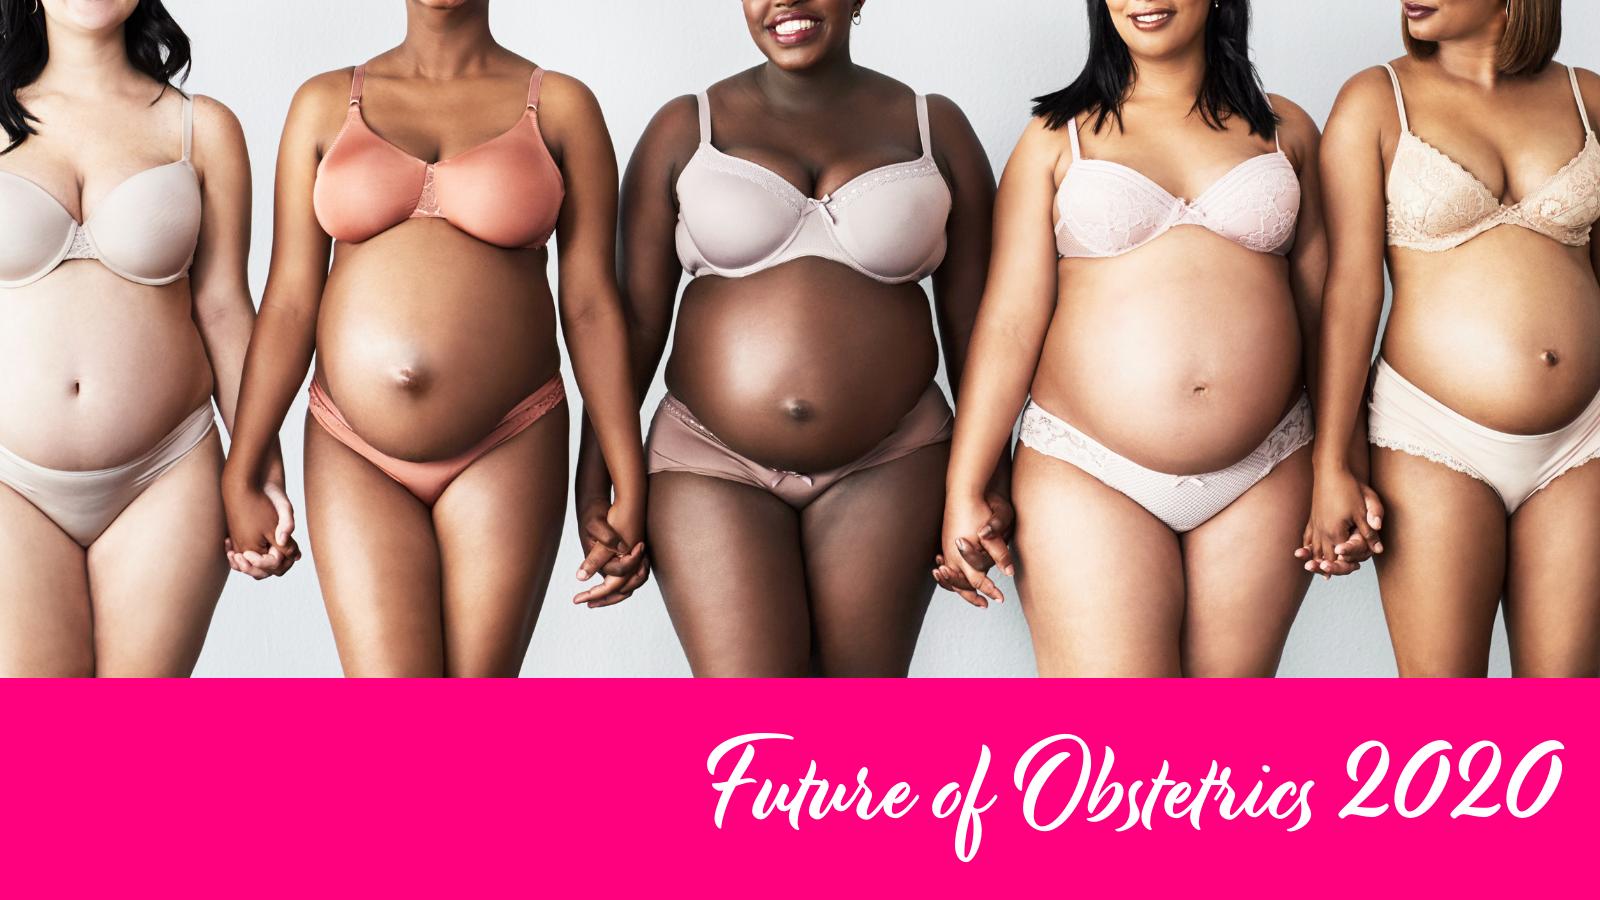 Future of Obstetrics 2020 (1)